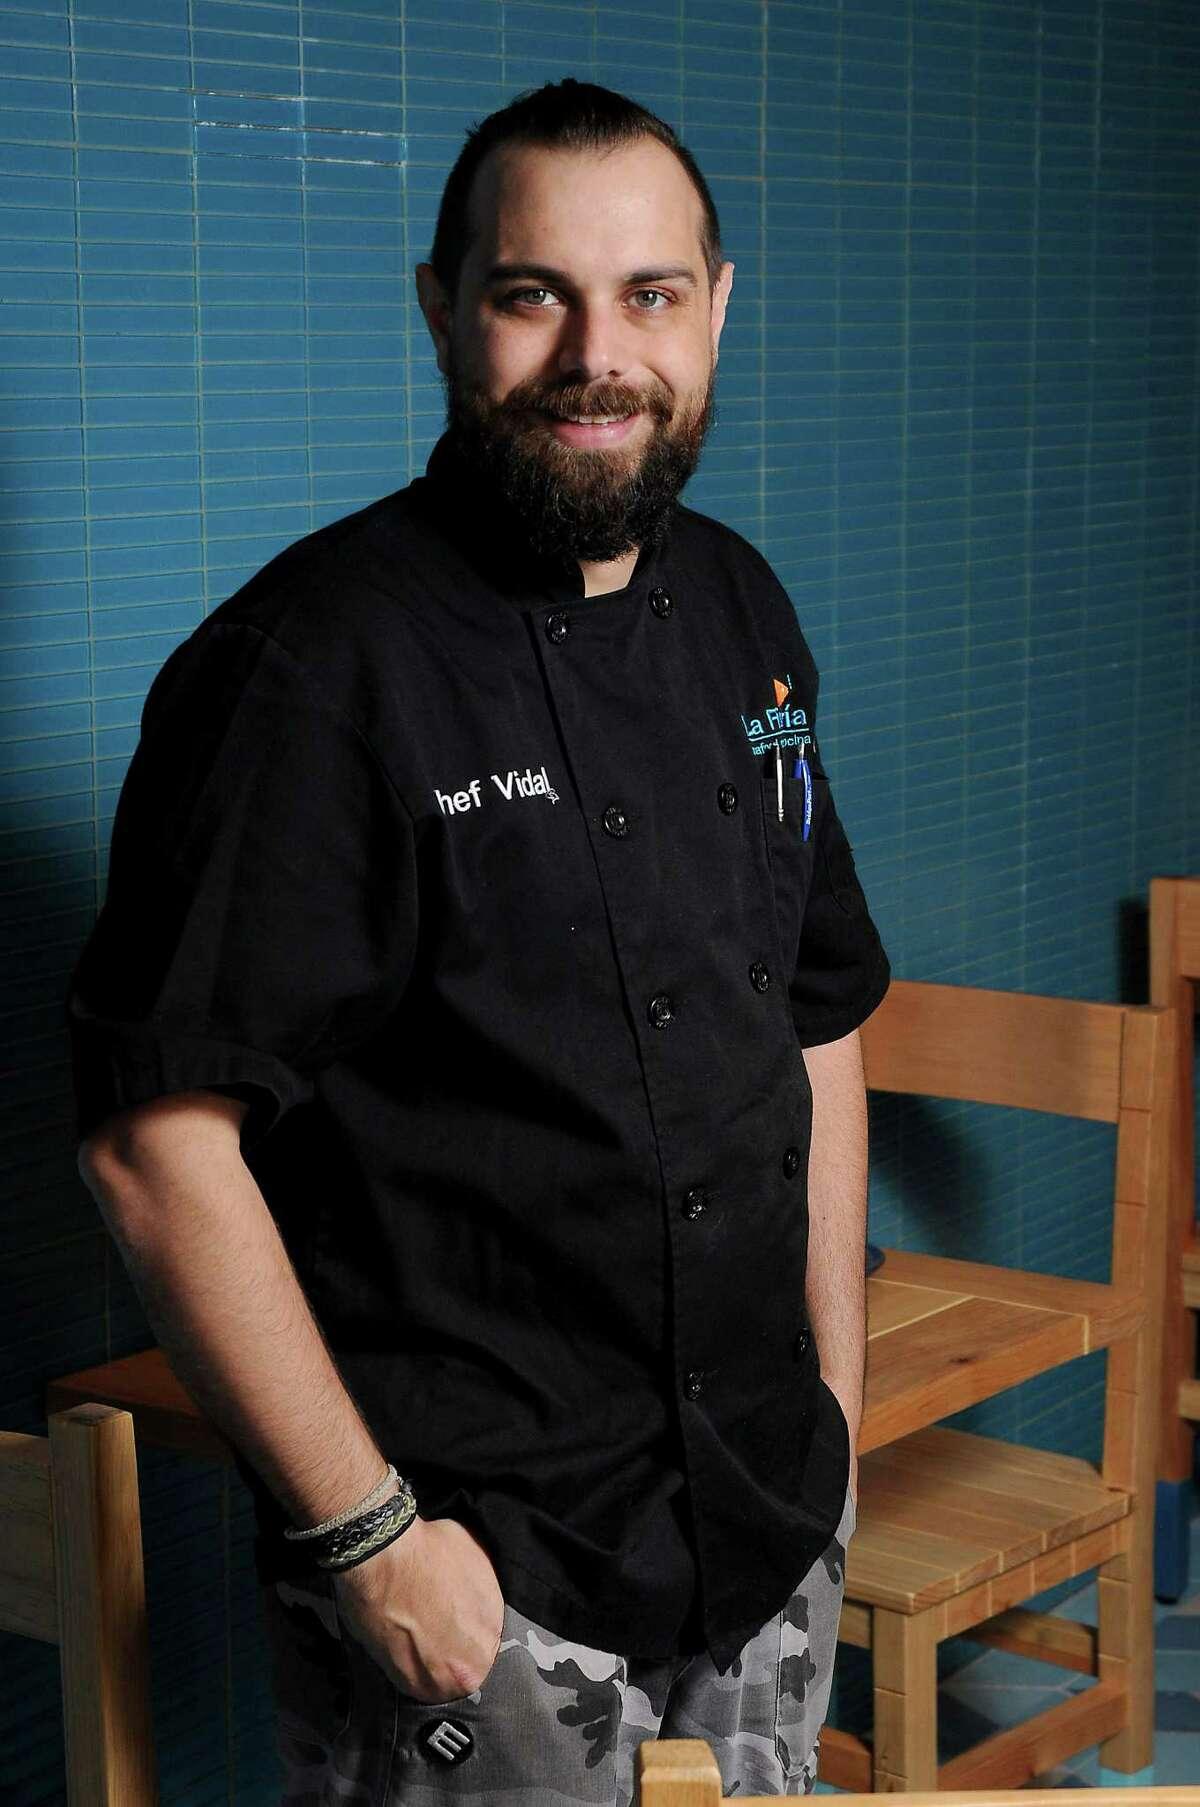 Chef Vidal Elias at the new La Fisheria at 213 Milam Thursday Jan. 14, 2016.(Dave Rossman photo)